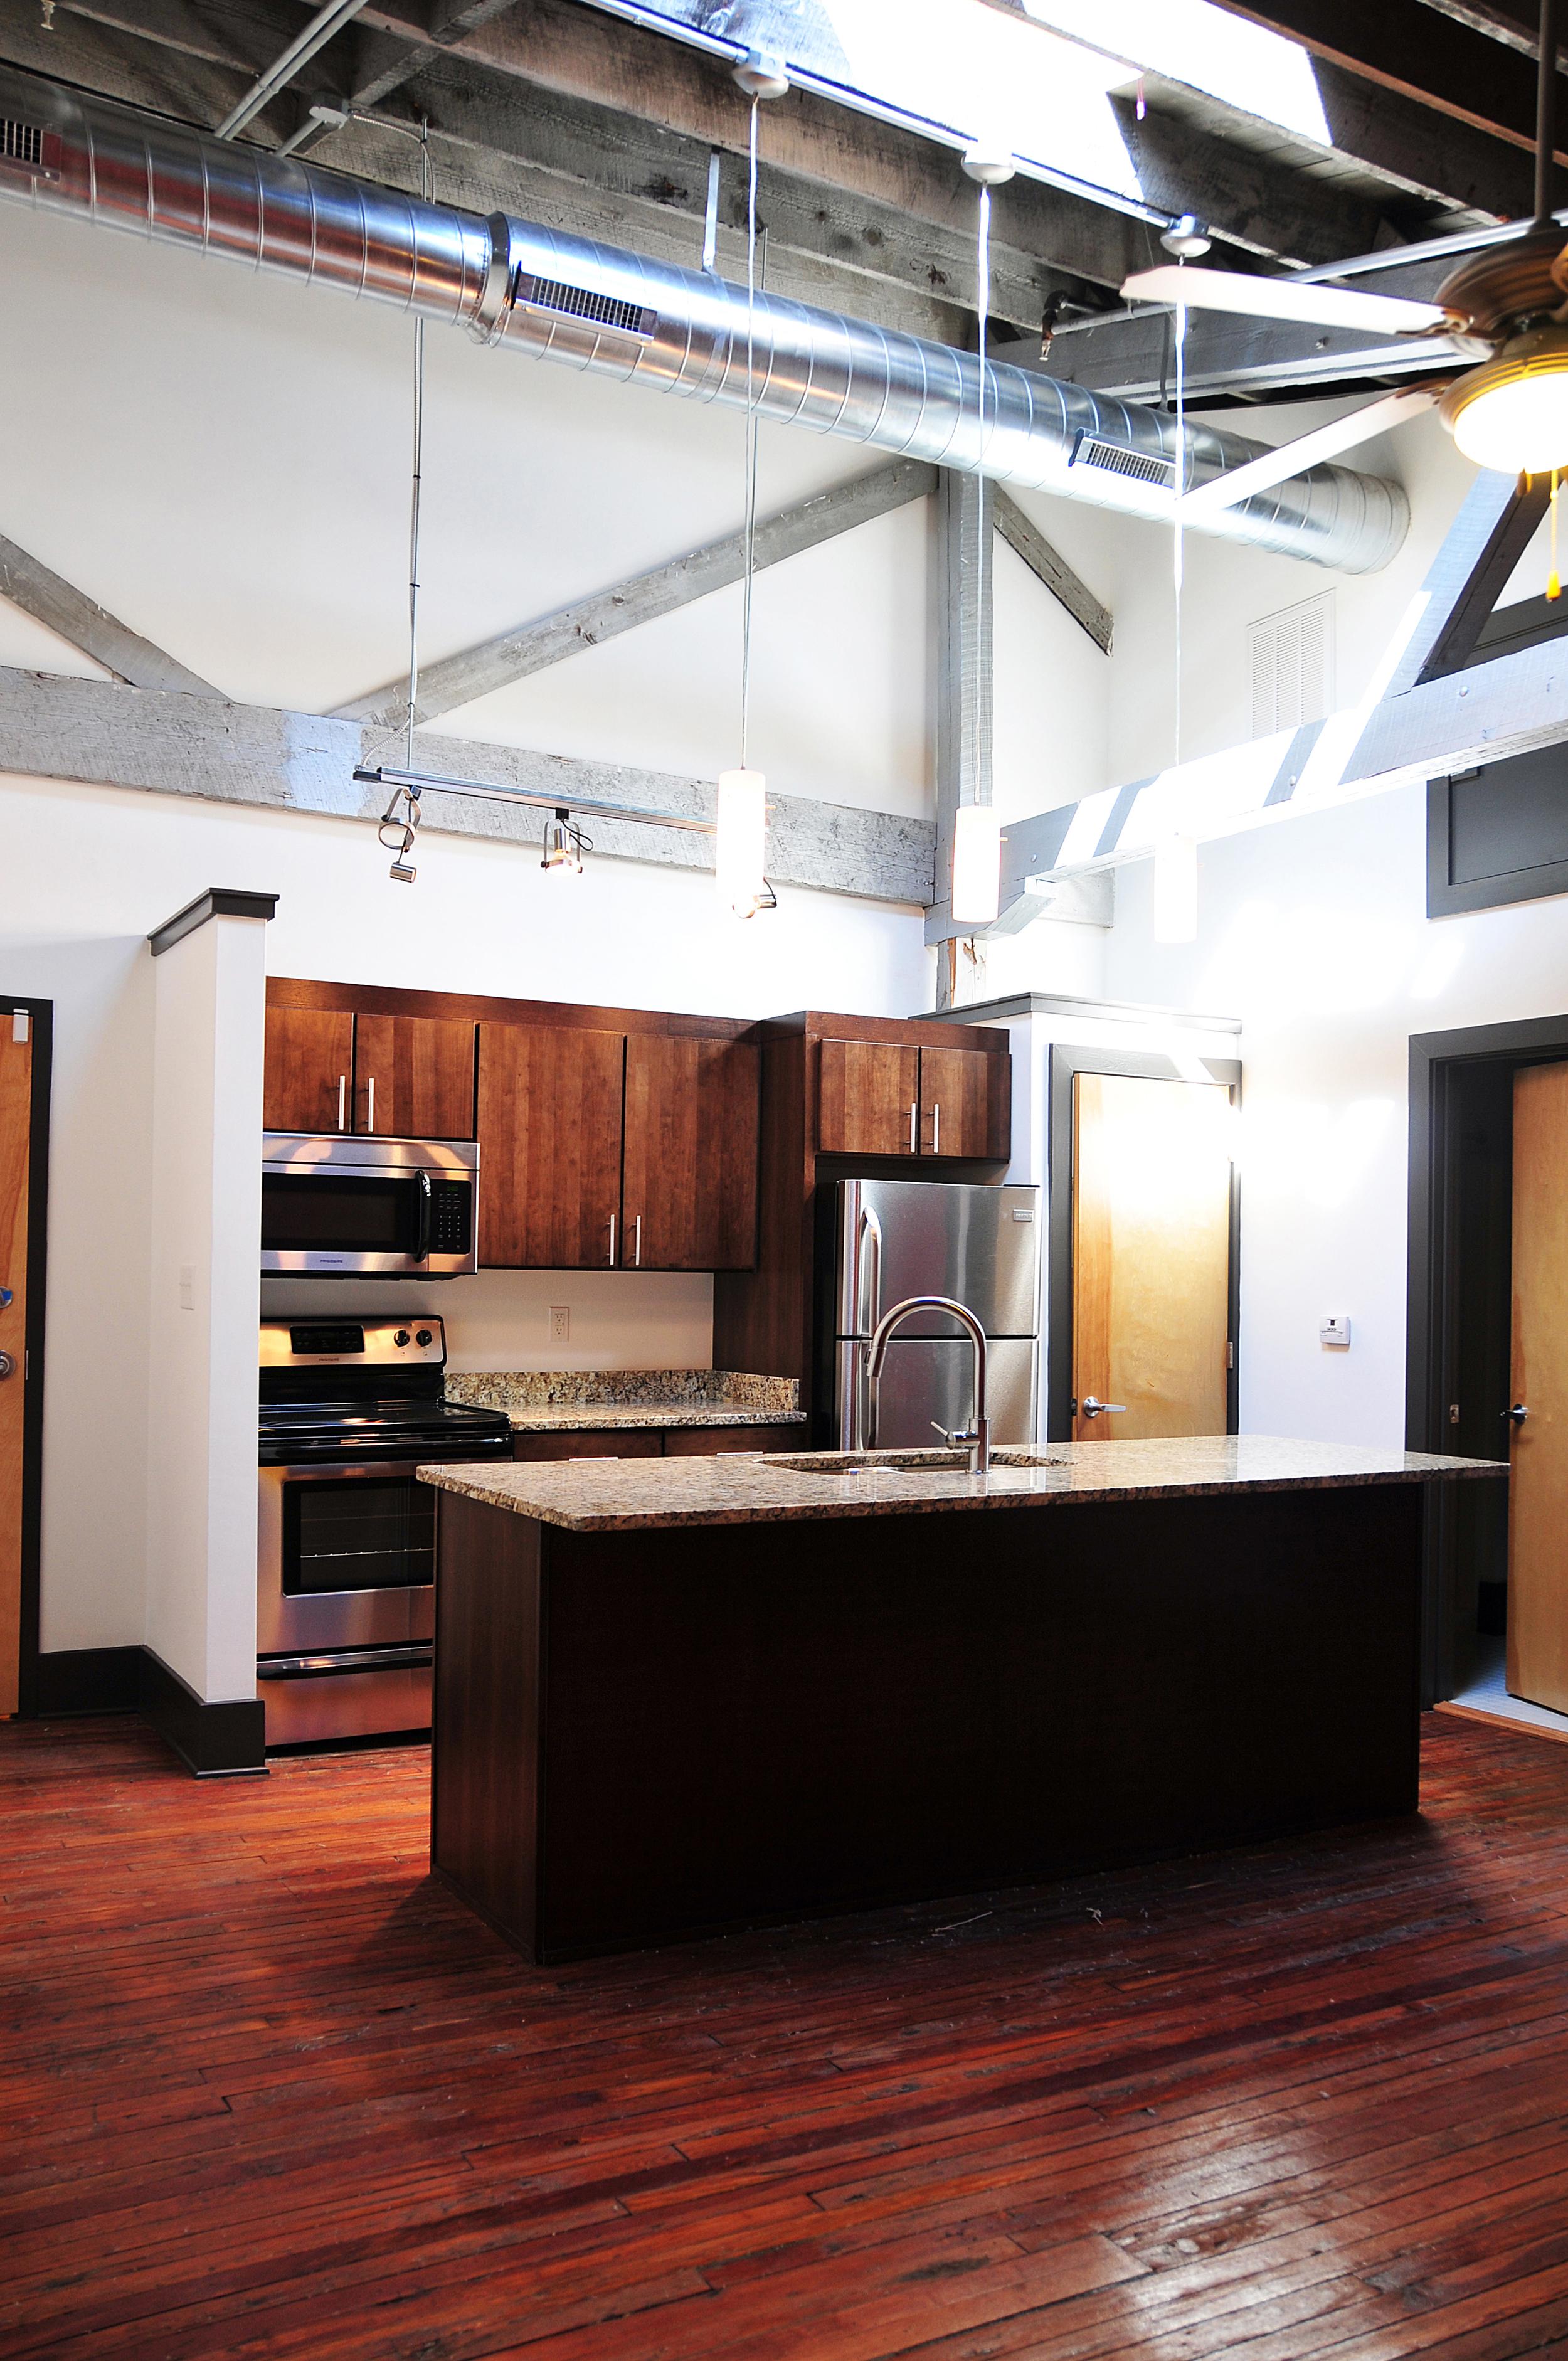 5 spot flats - ceiling